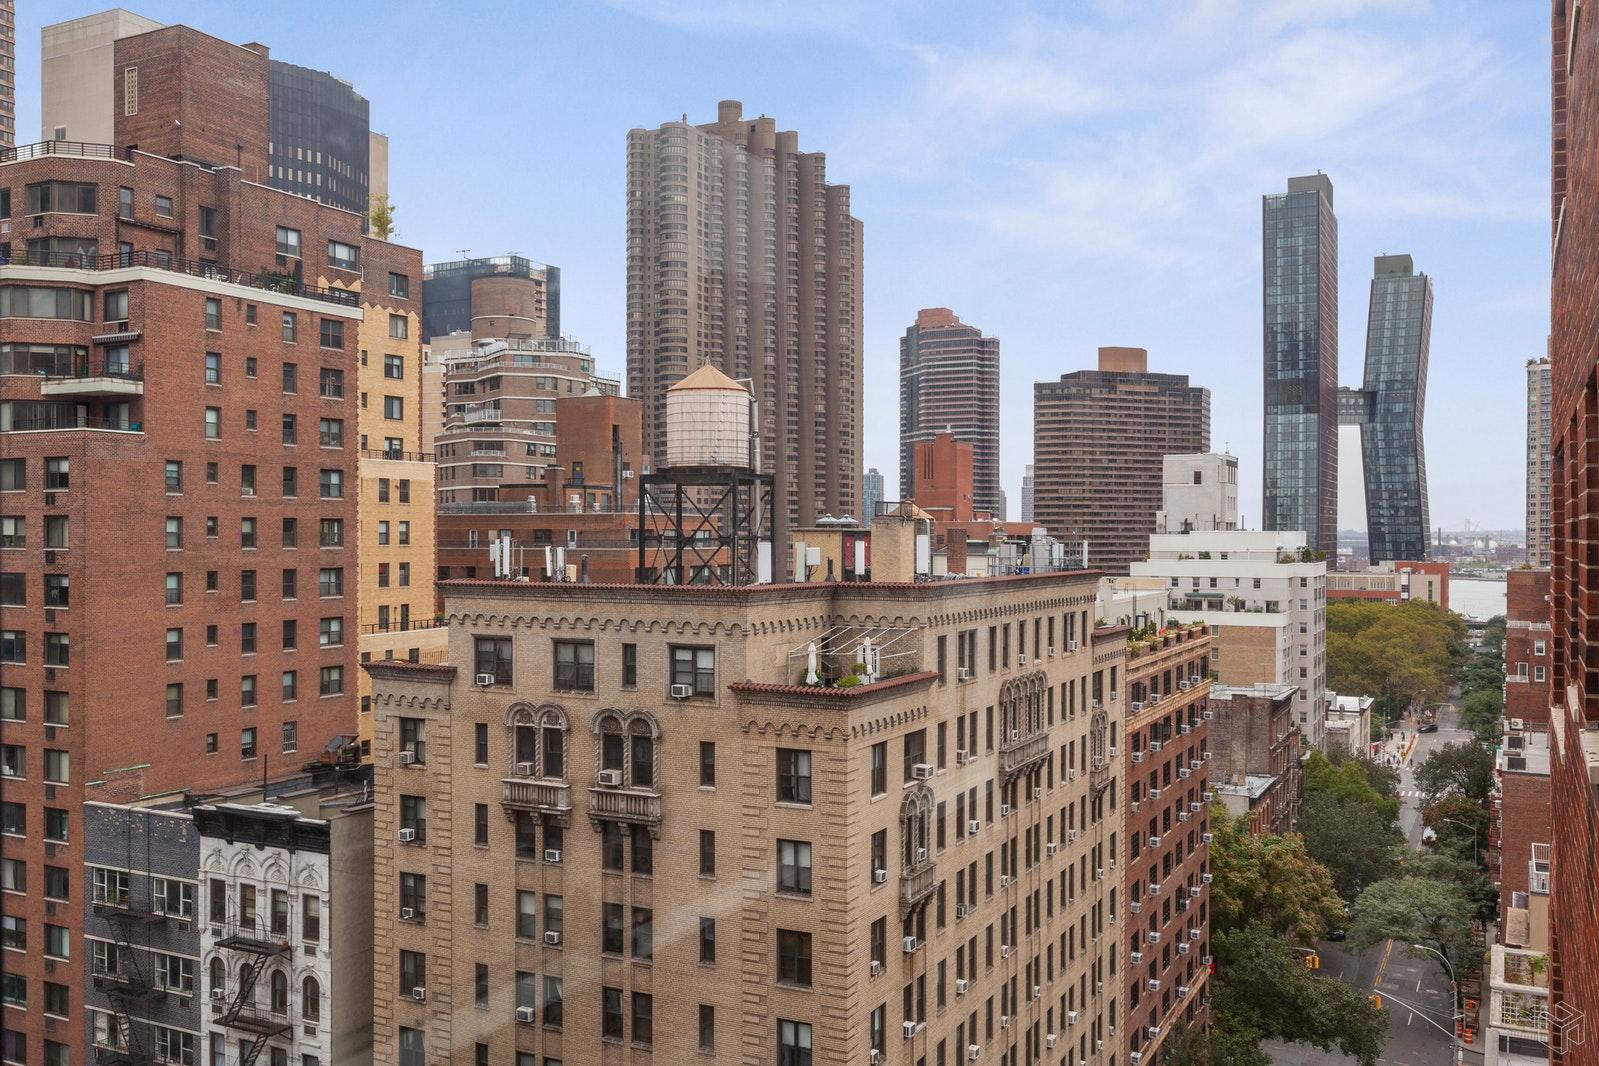 166 EAST 35TH STREET 14D, Midtown East, $495,000, Web #: 19078281